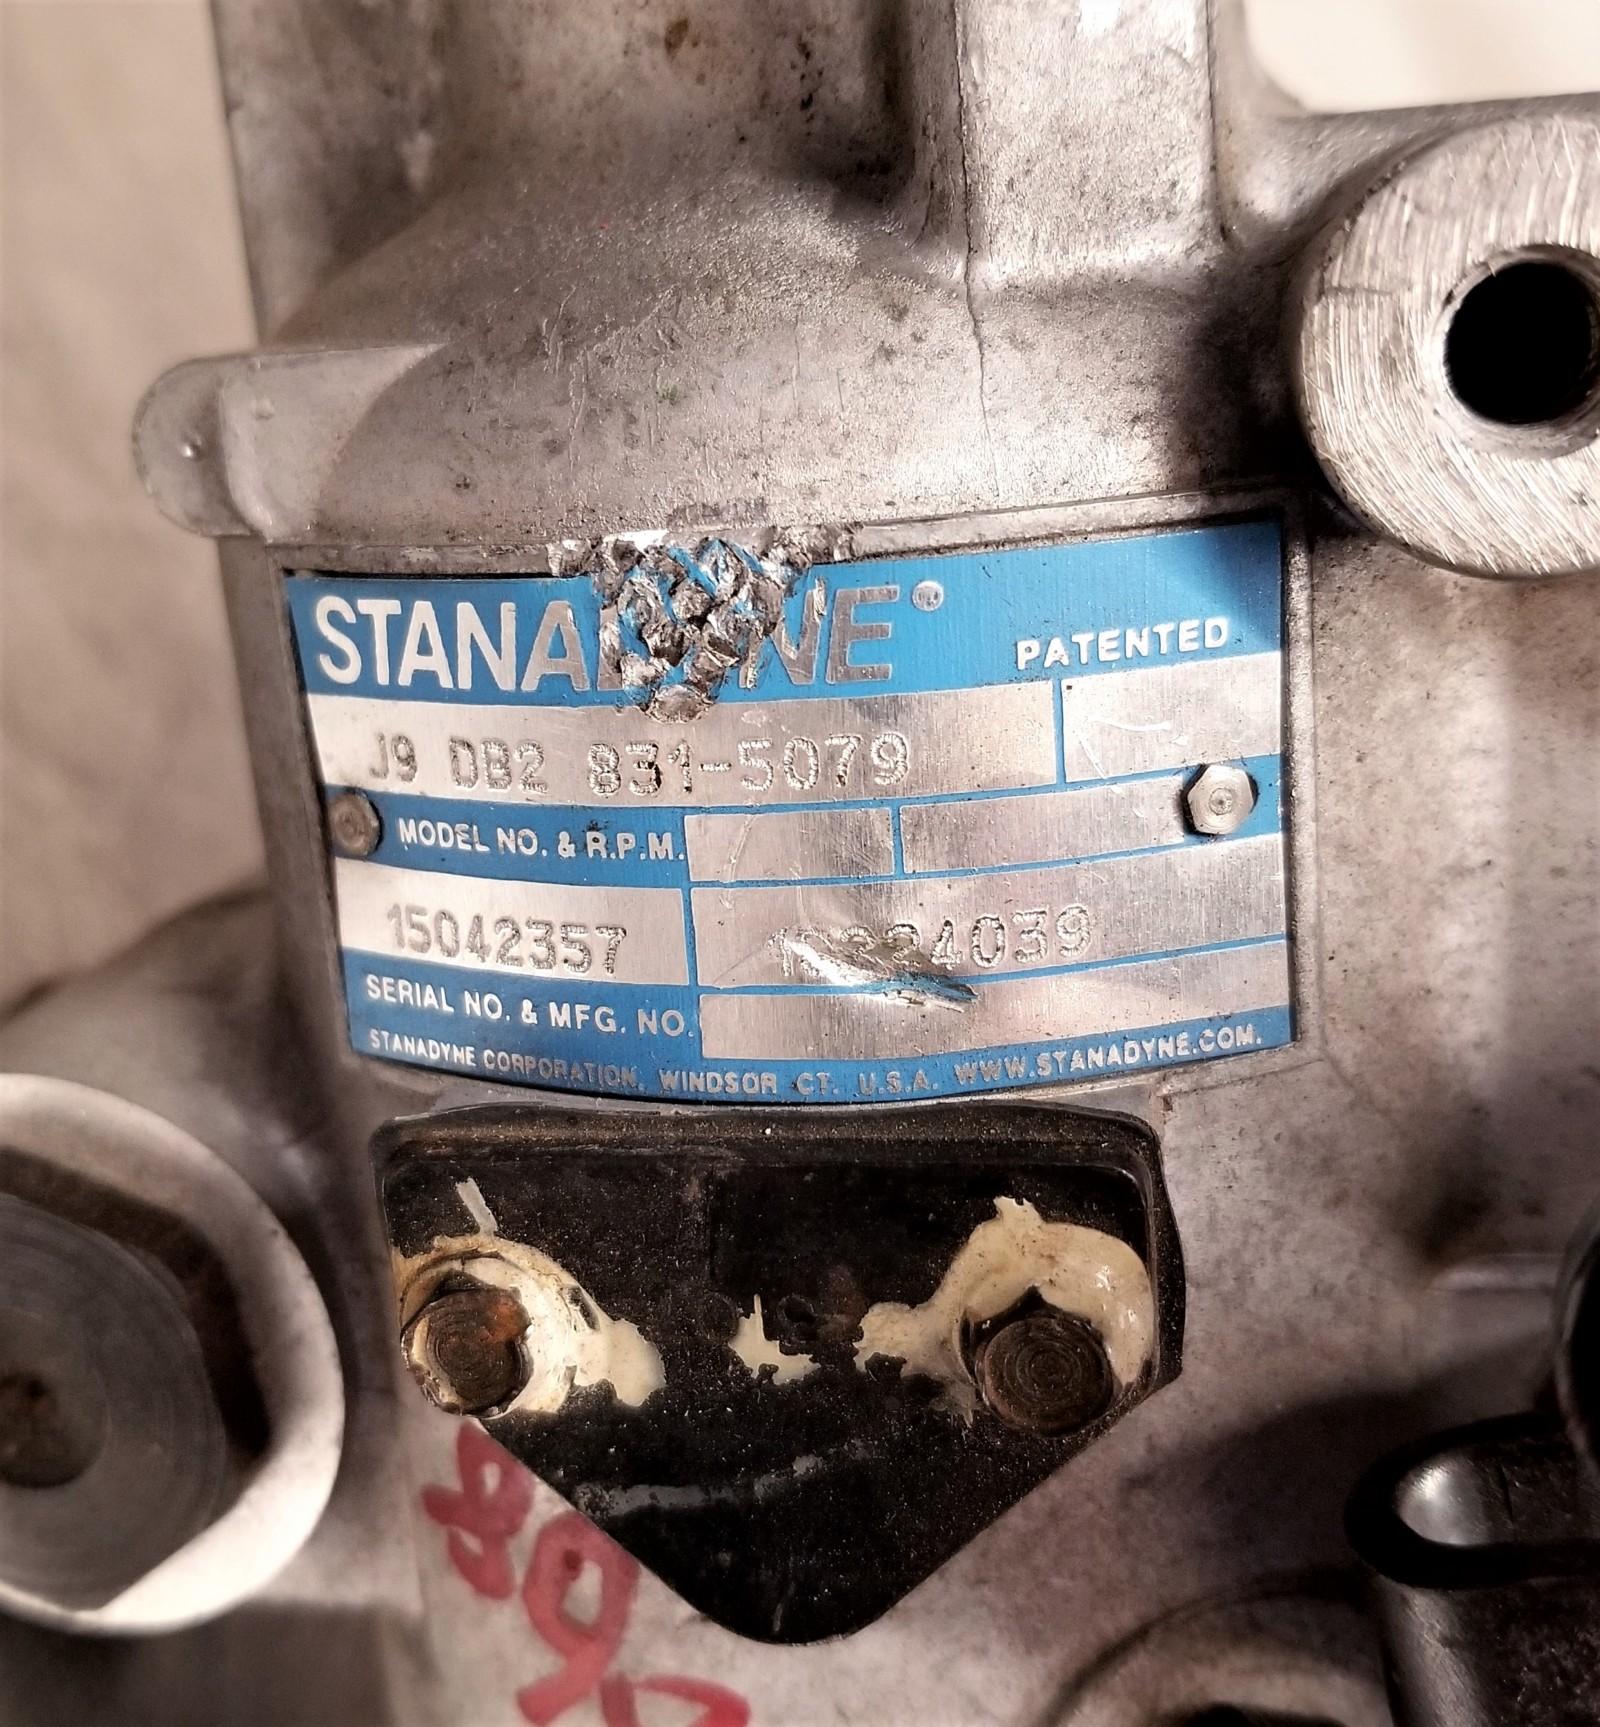 J9DB28315079 GMC 6.2L Diesel Stanadyne Injection Pump